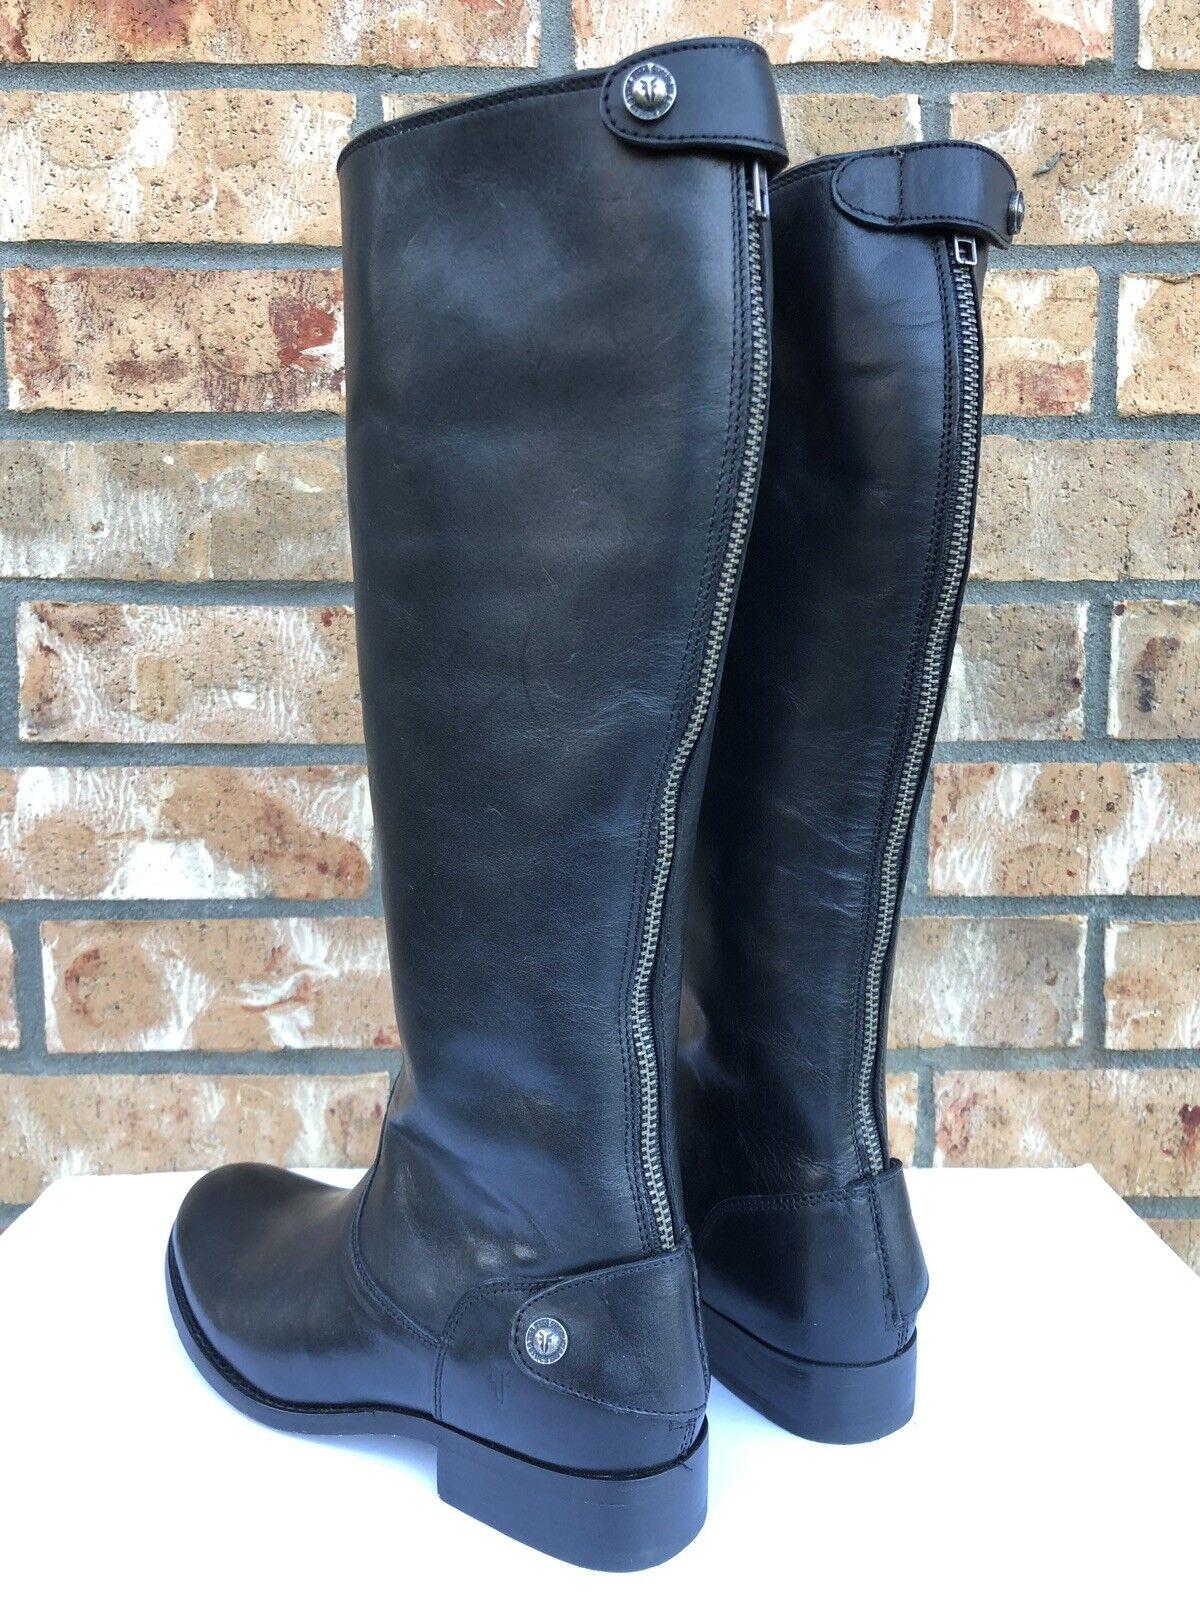 Women's Frye Frye Frye Melissa Button Back Zip Black Leather Knee High Riding Boots bdf69a